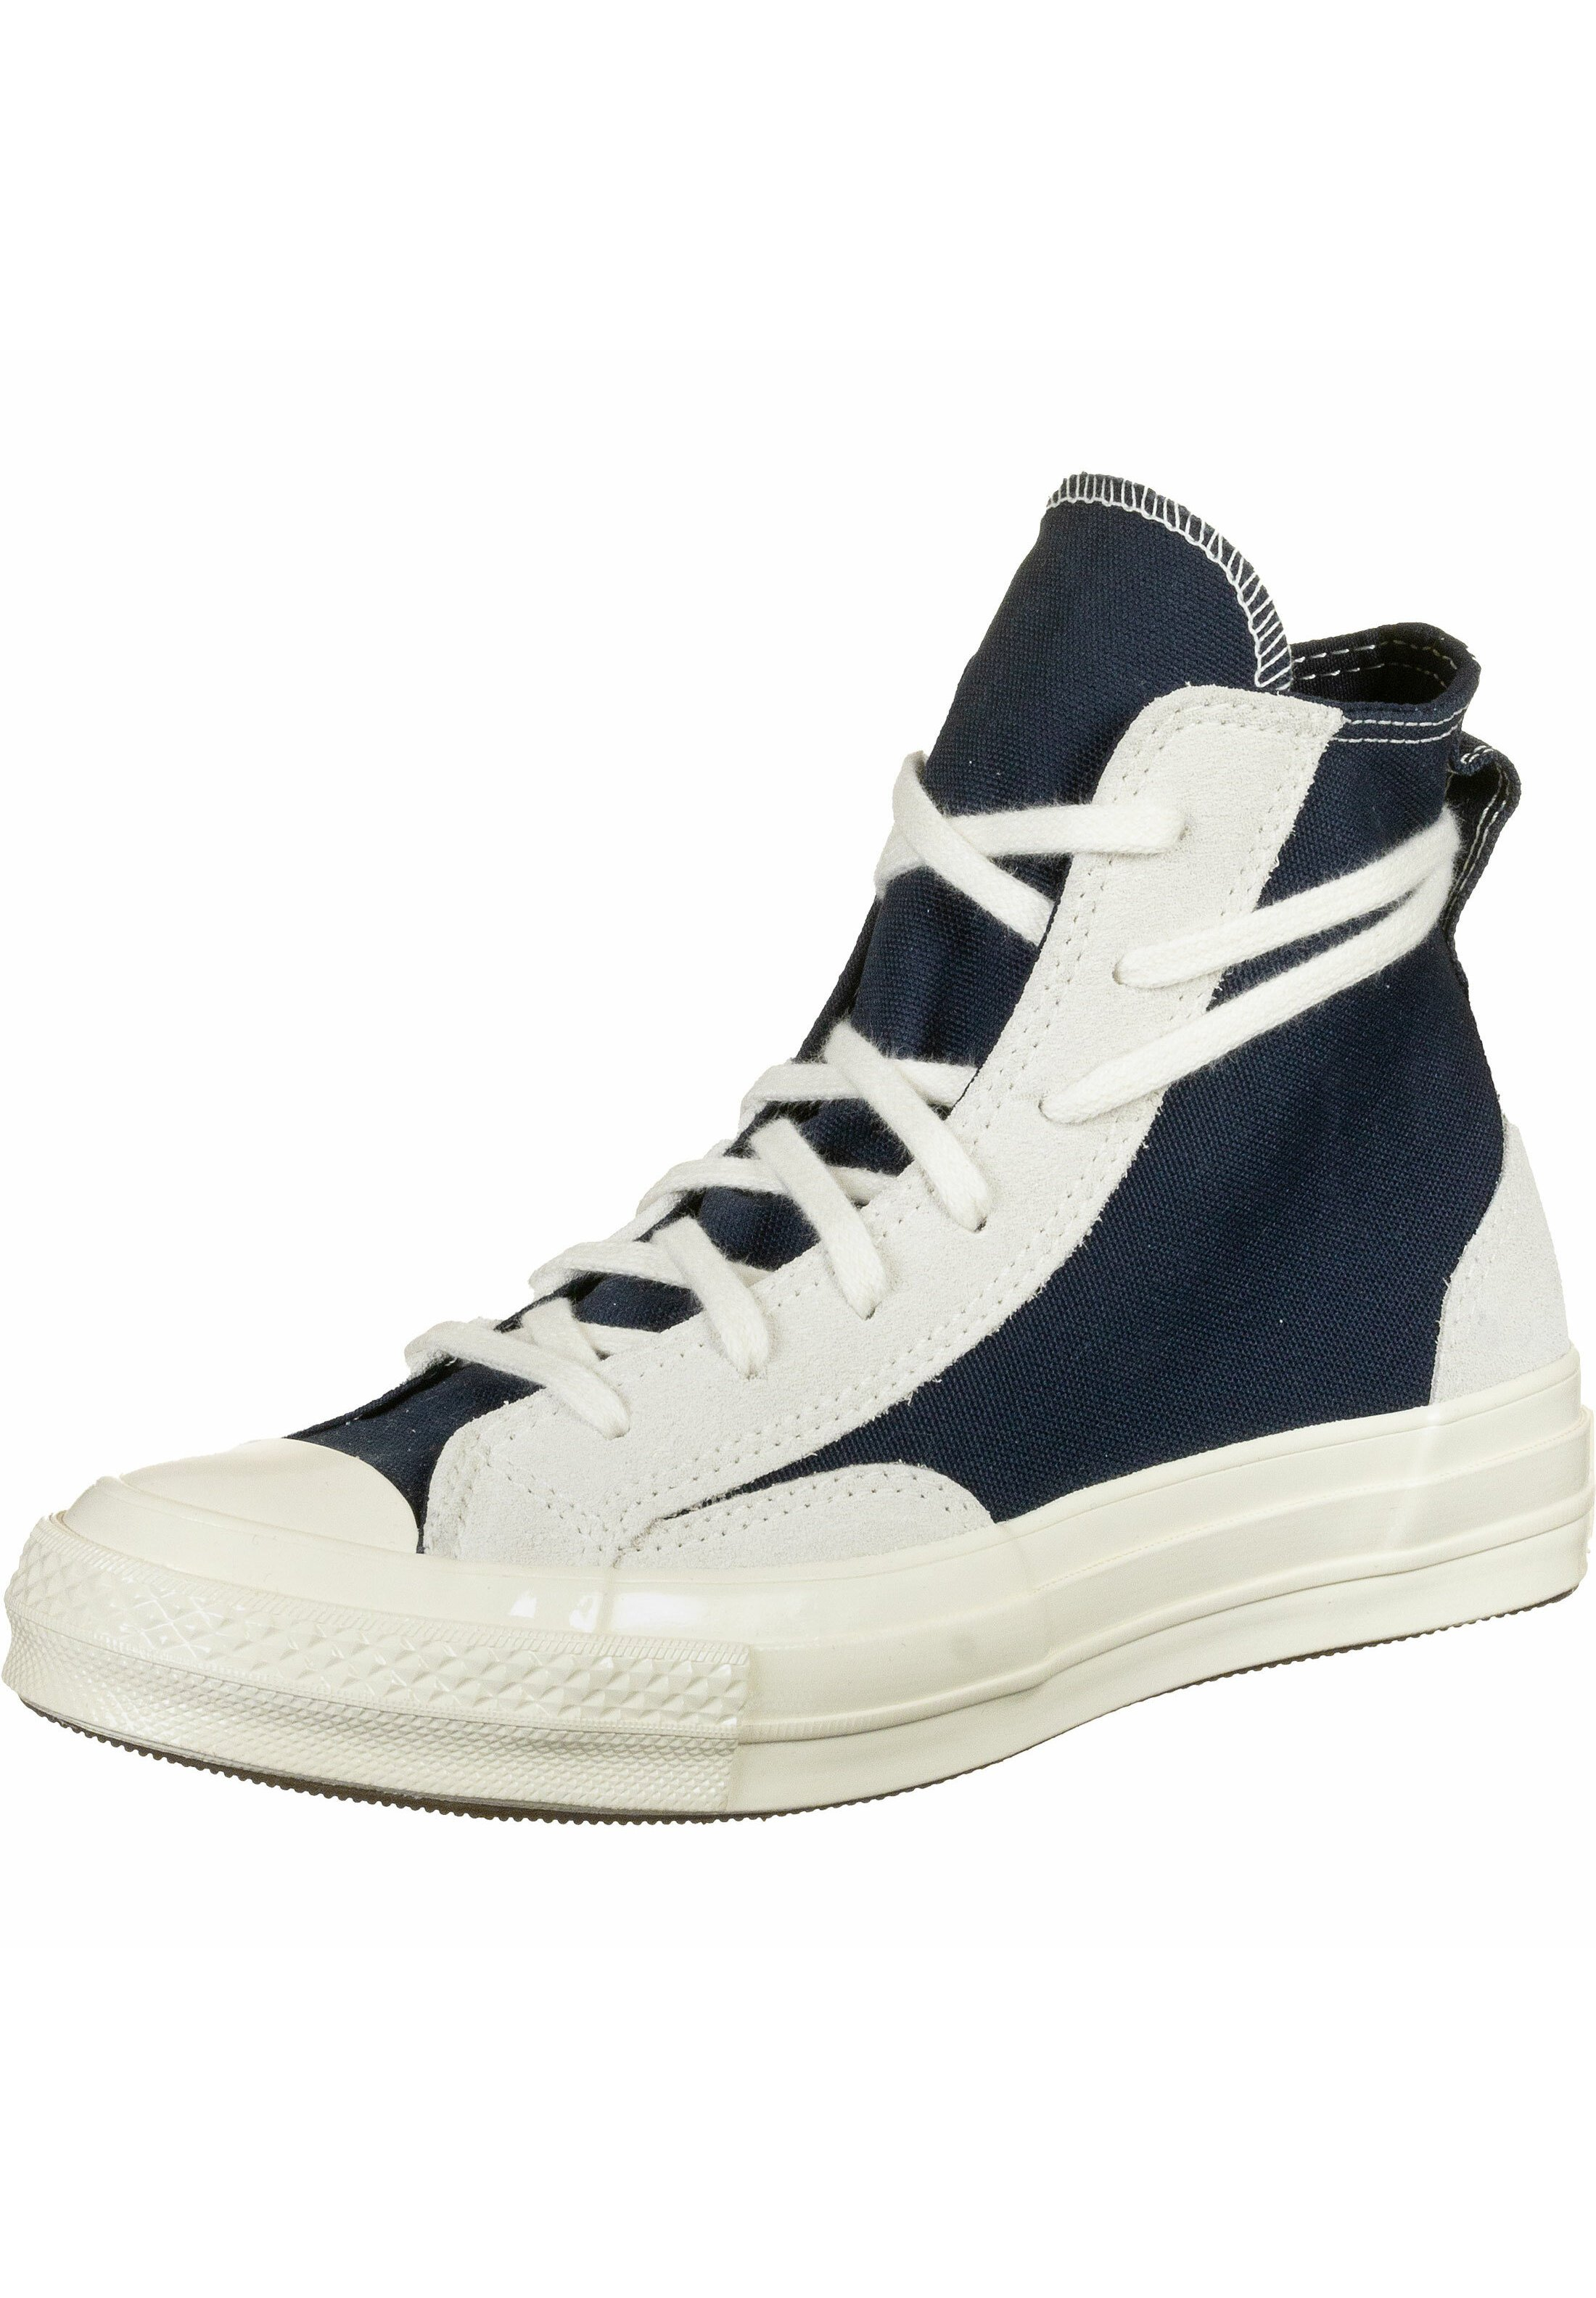 Converse Sneakers High - Obsidian/egret/egret